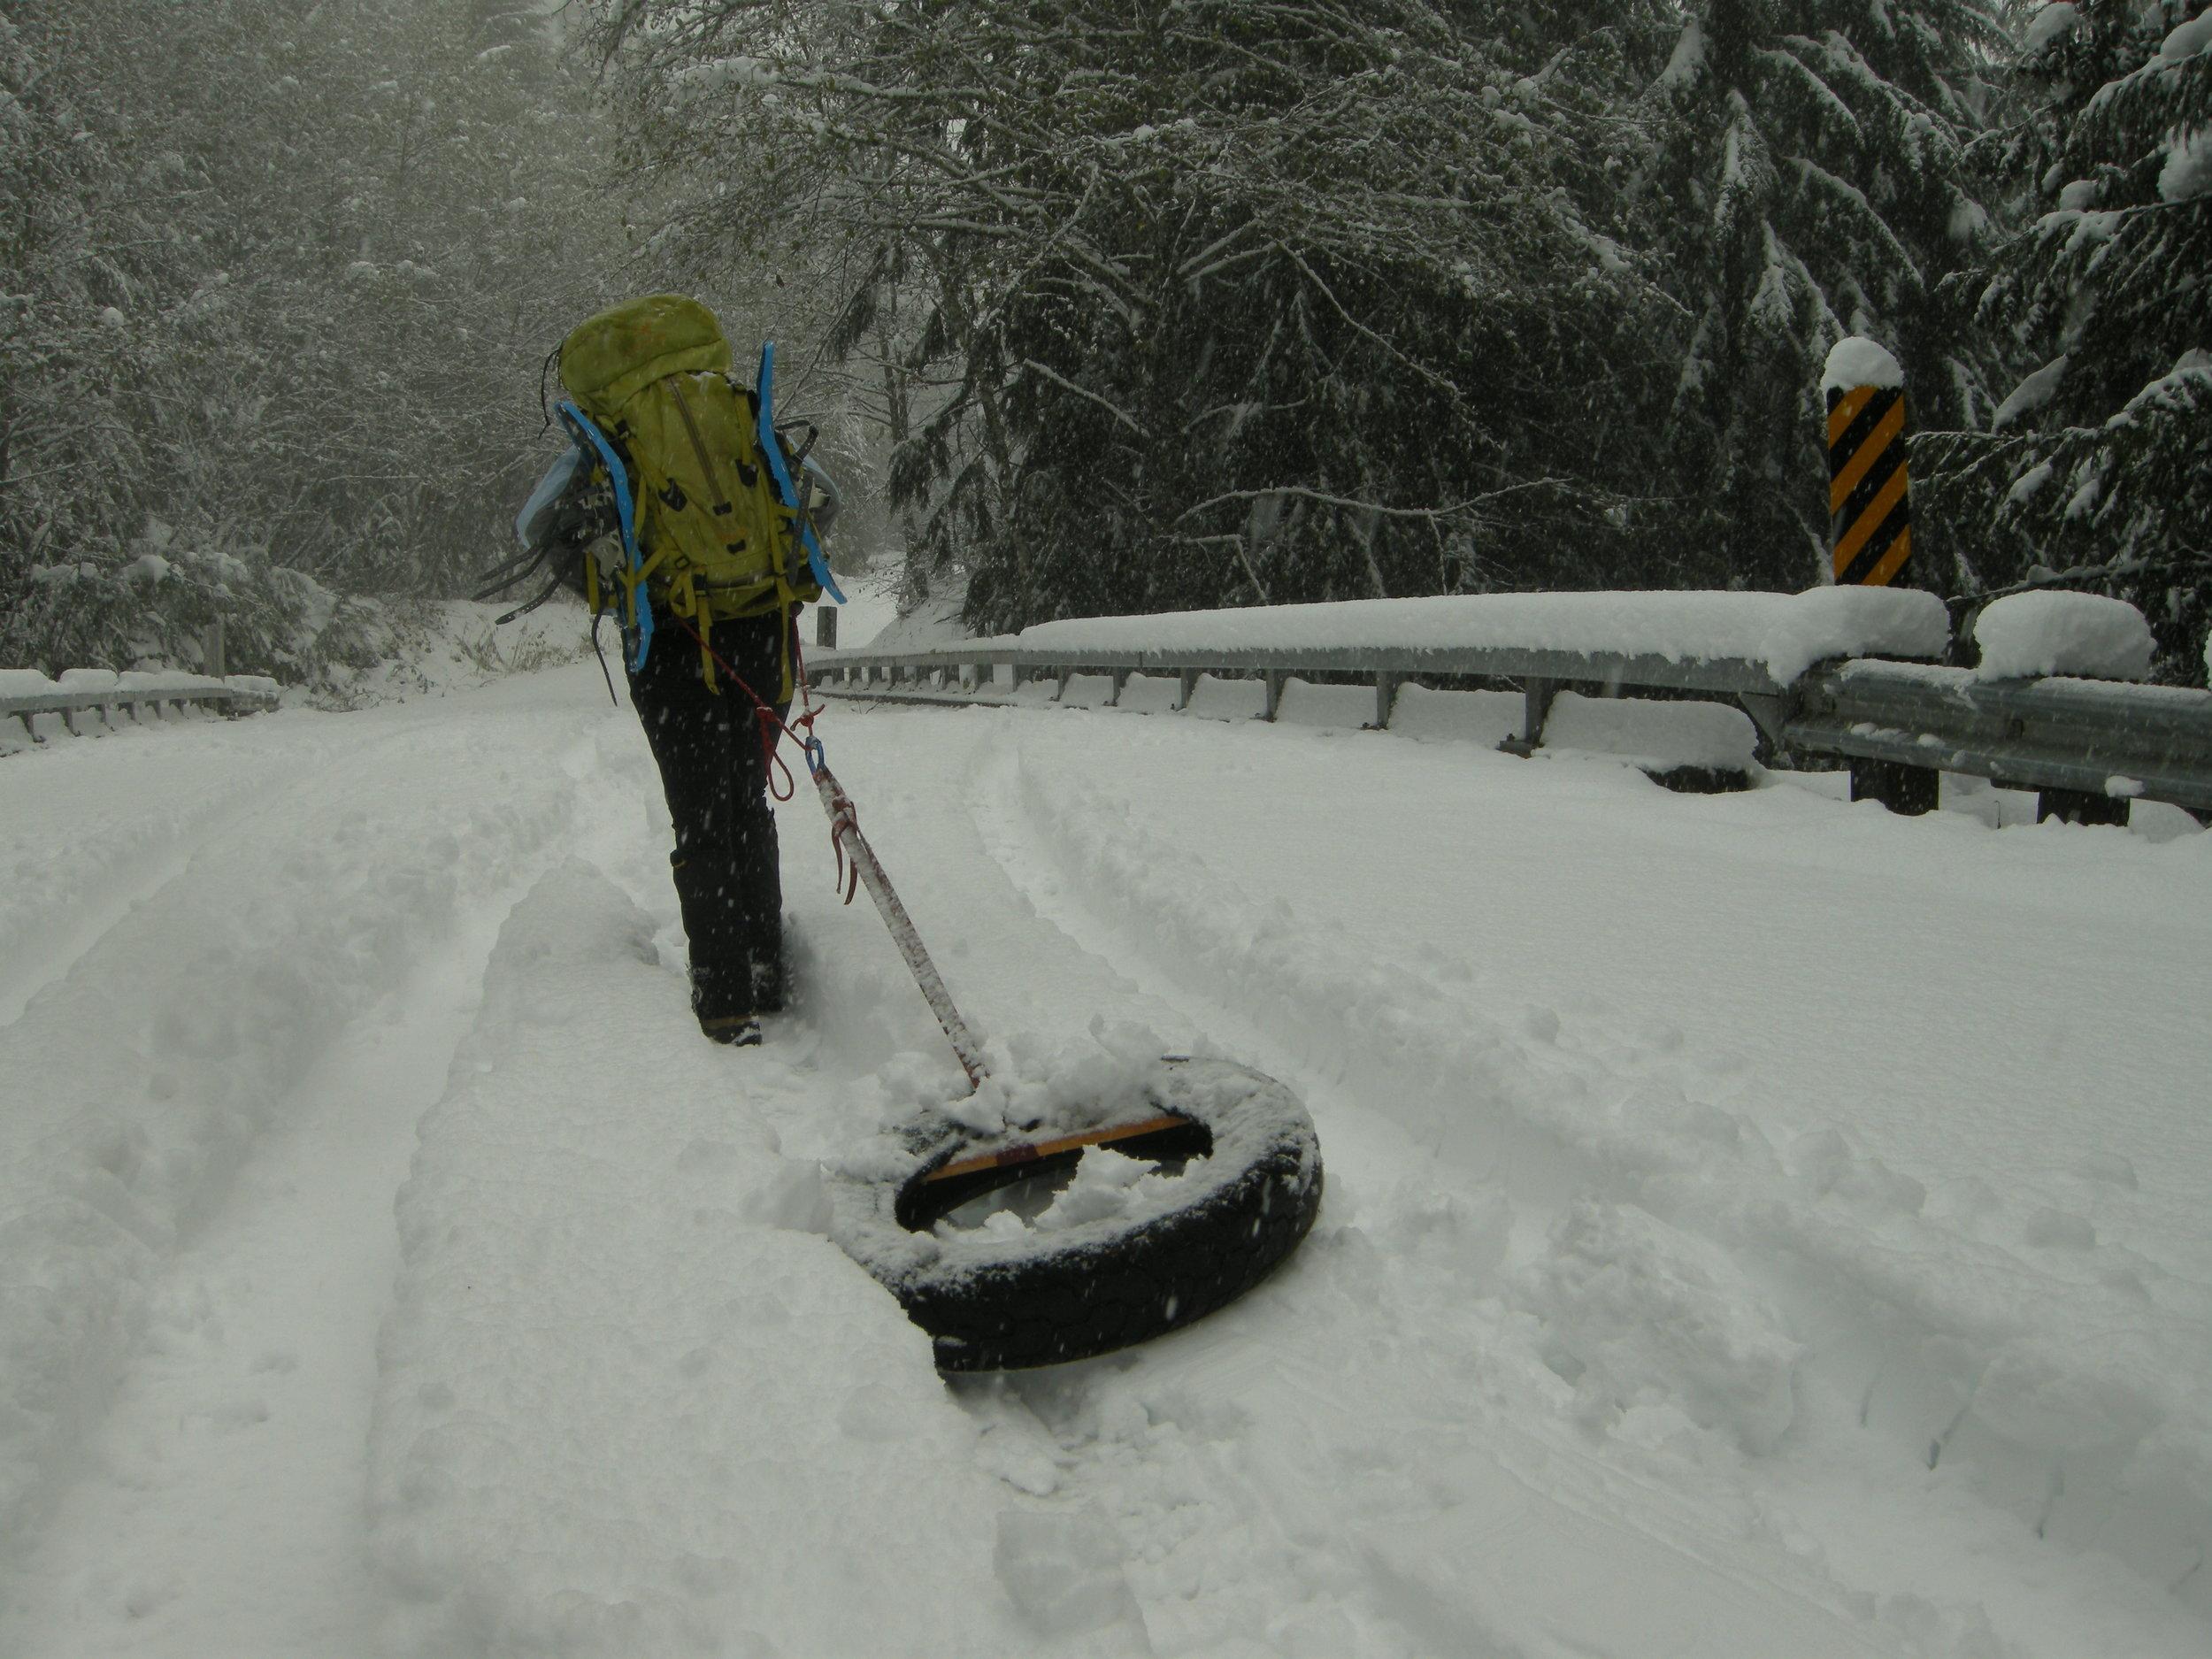 Mt Baker Snoqualmie forrst - tire dragging 2.jpg